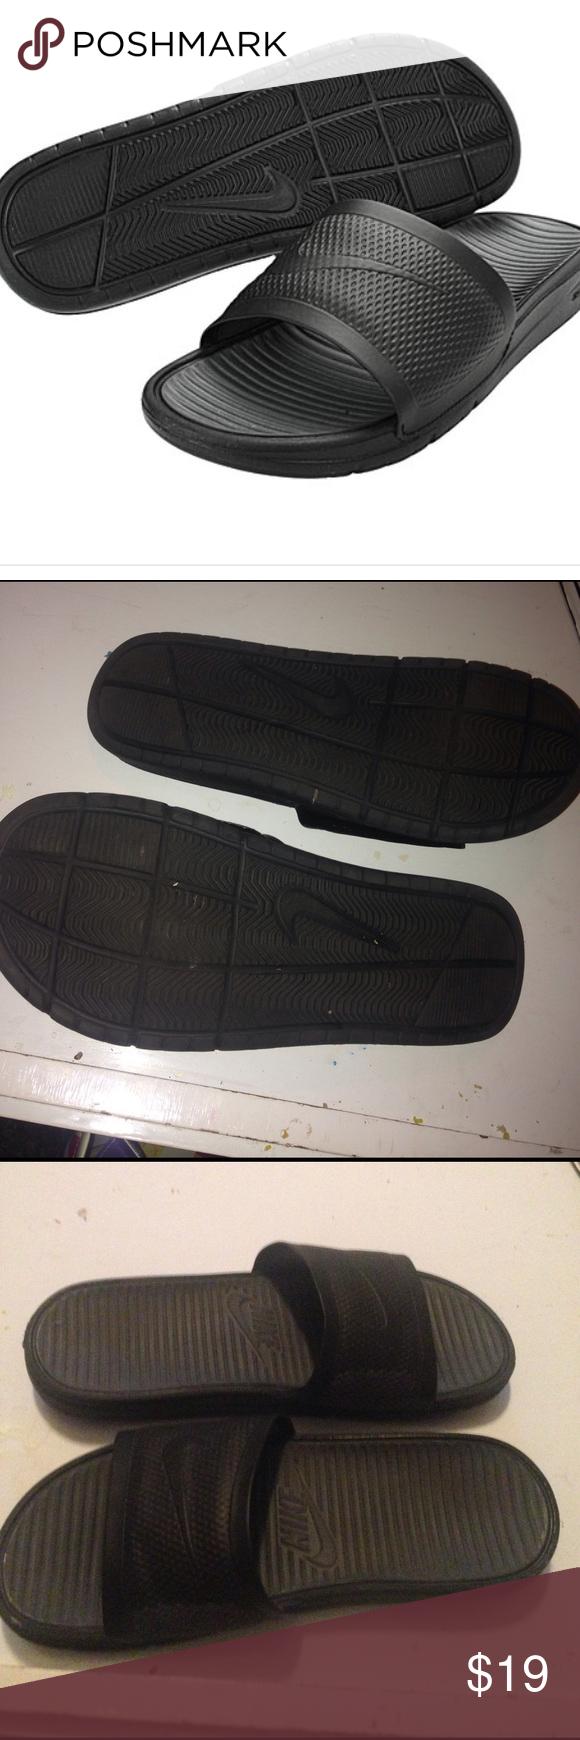 Black sandals size 11 - Nike Mens Benassi Solarsoft Black Sandals Shoes 11 431884 001 Xl Men S Size 11 Flats